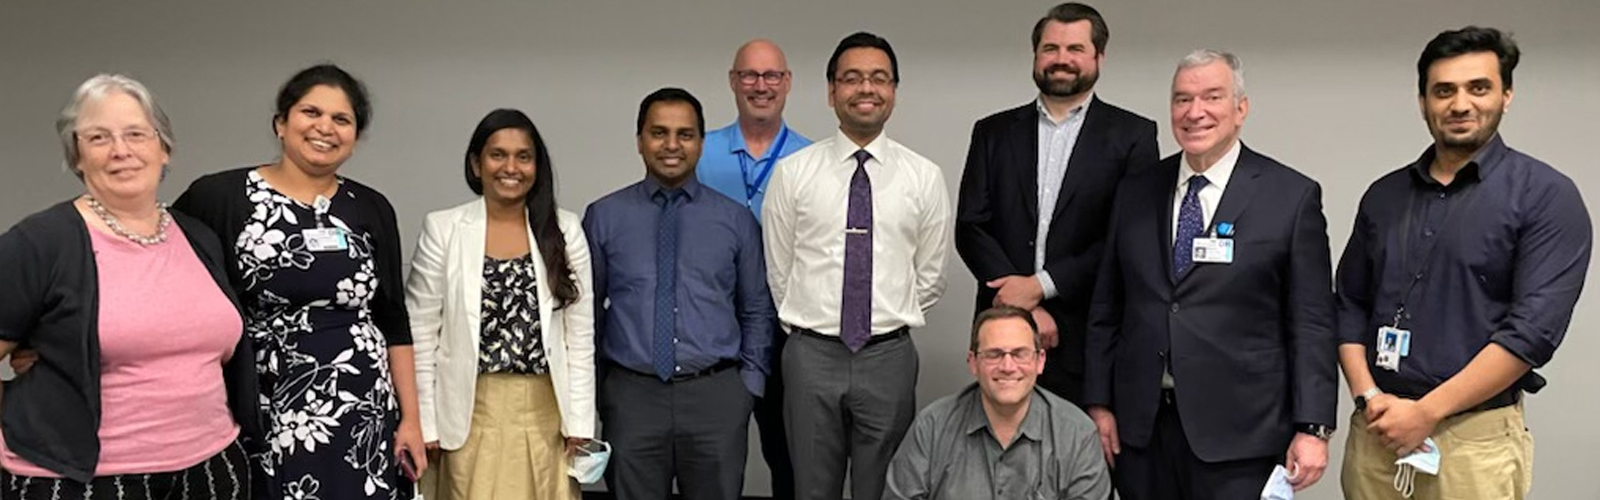 Infectious Disease Fellowship Members